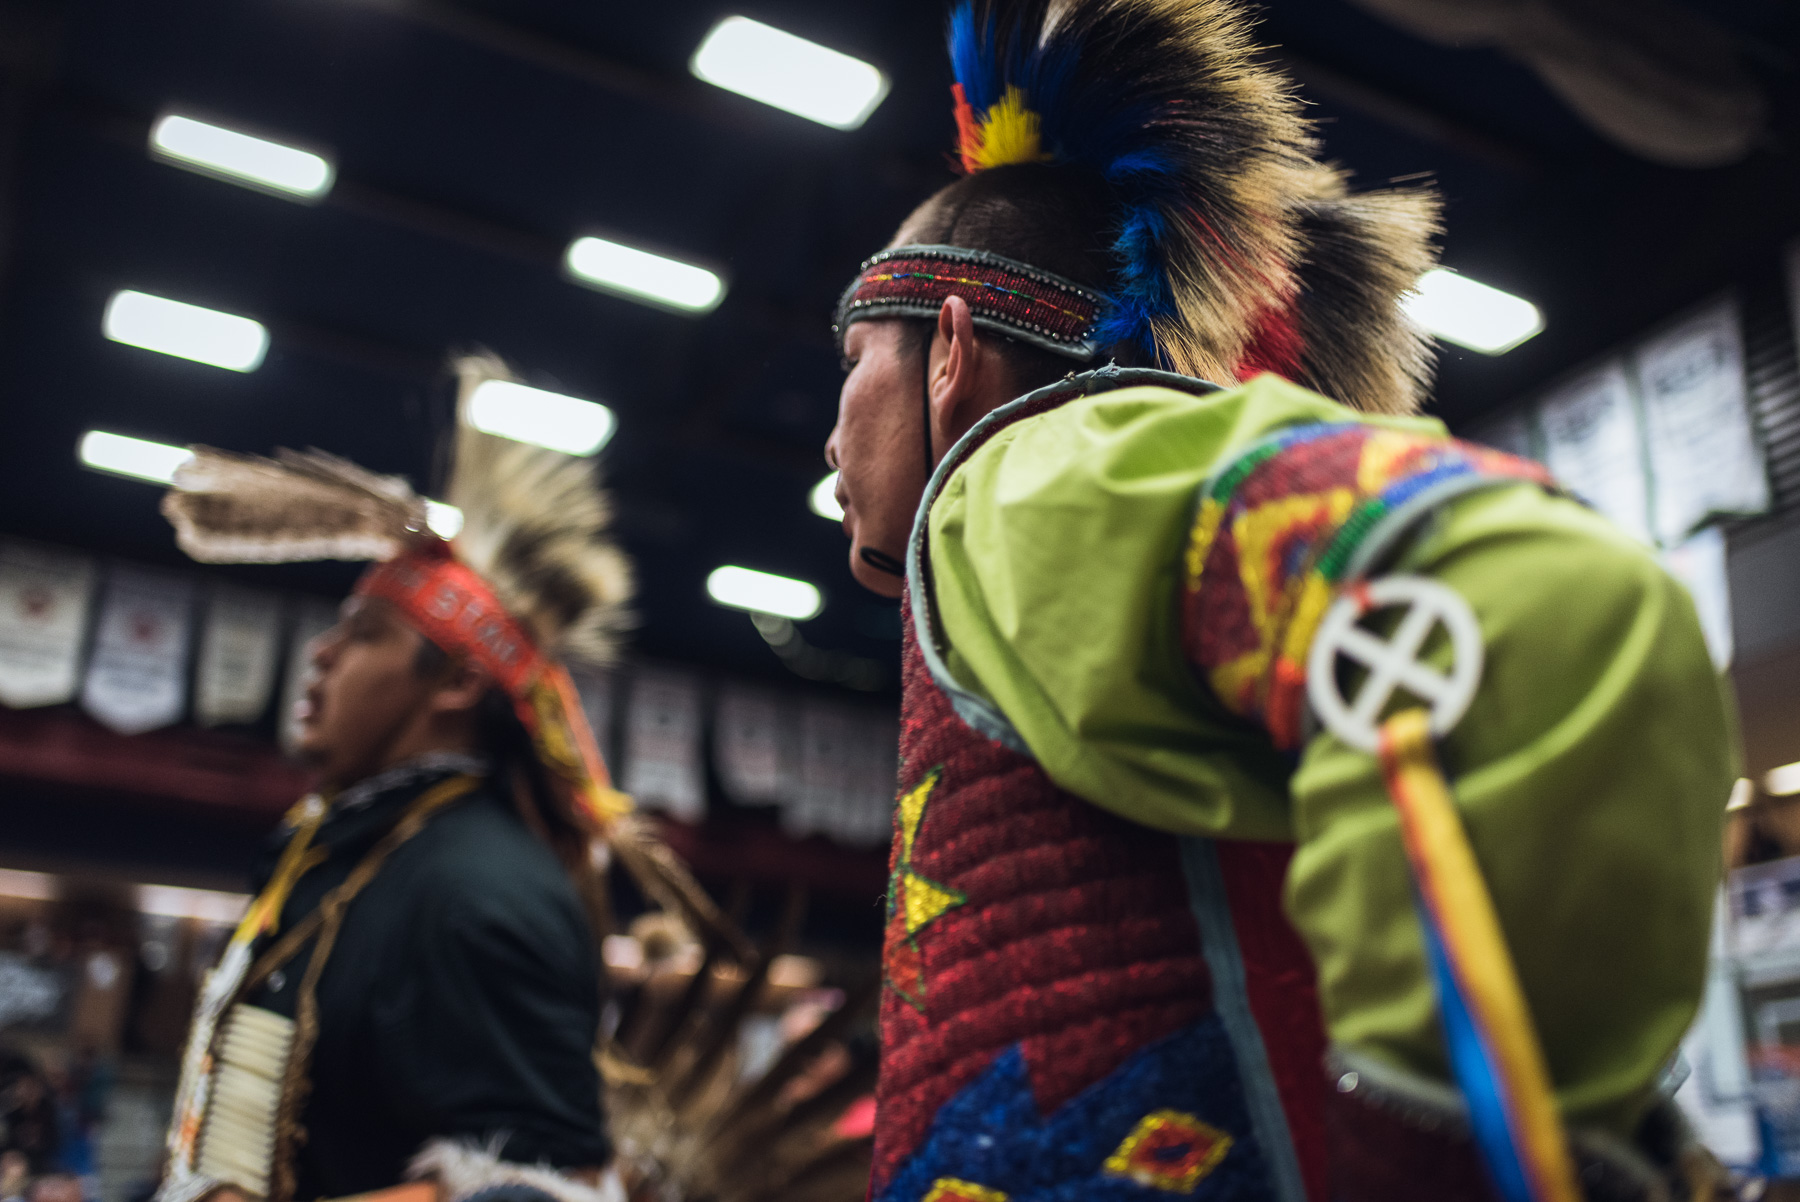 31st-Annual-LUNSA-Powwow-Blog-109.jpg